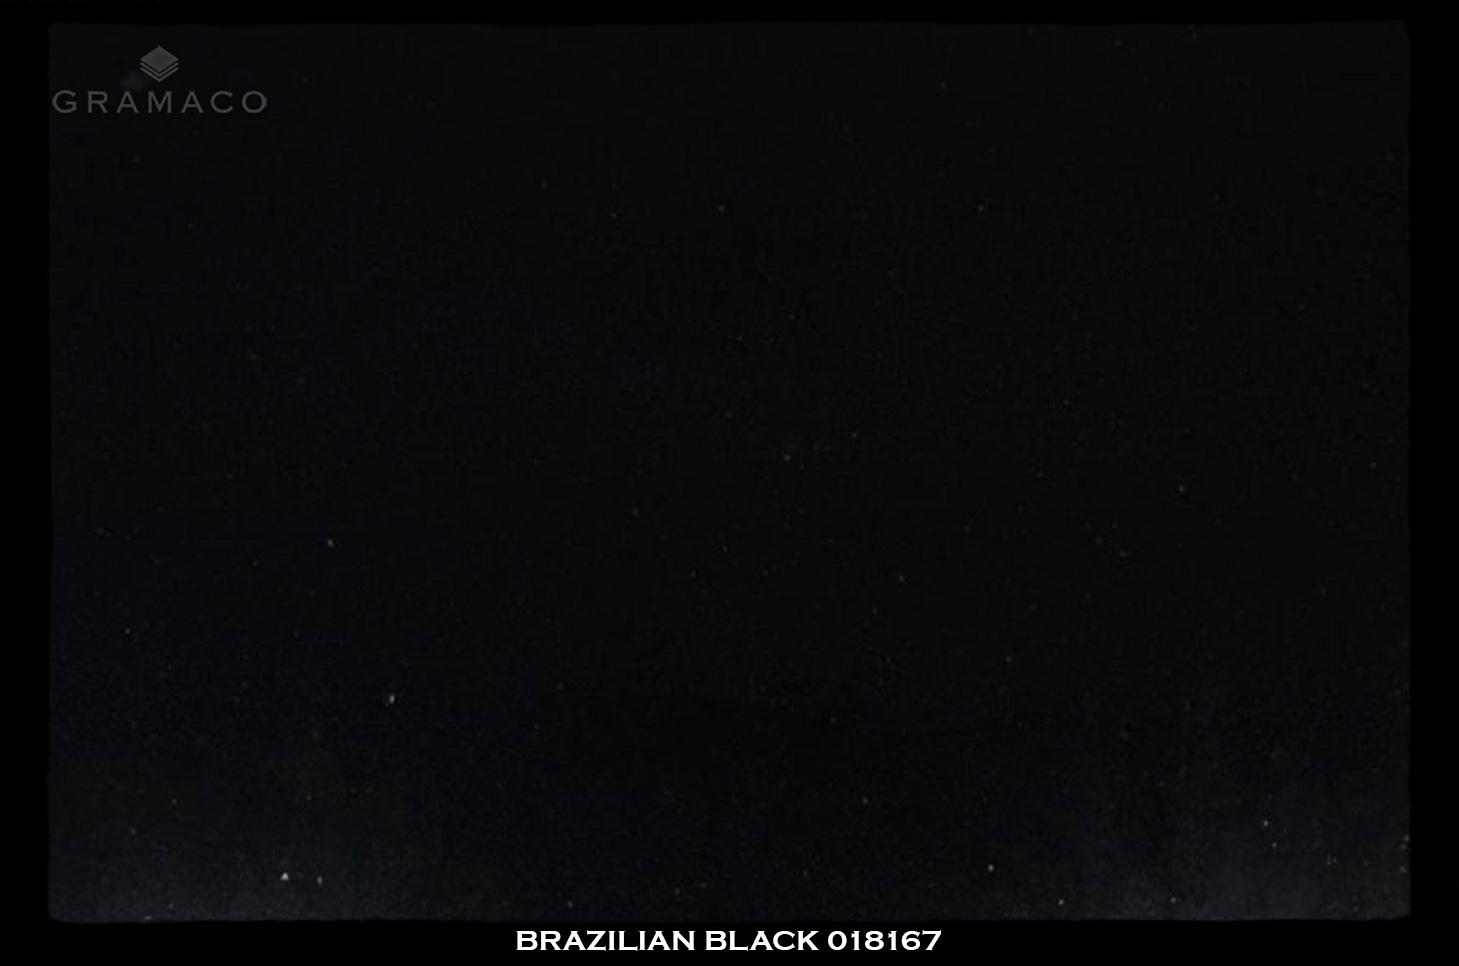 BRAZILIAN_BLACK-018167